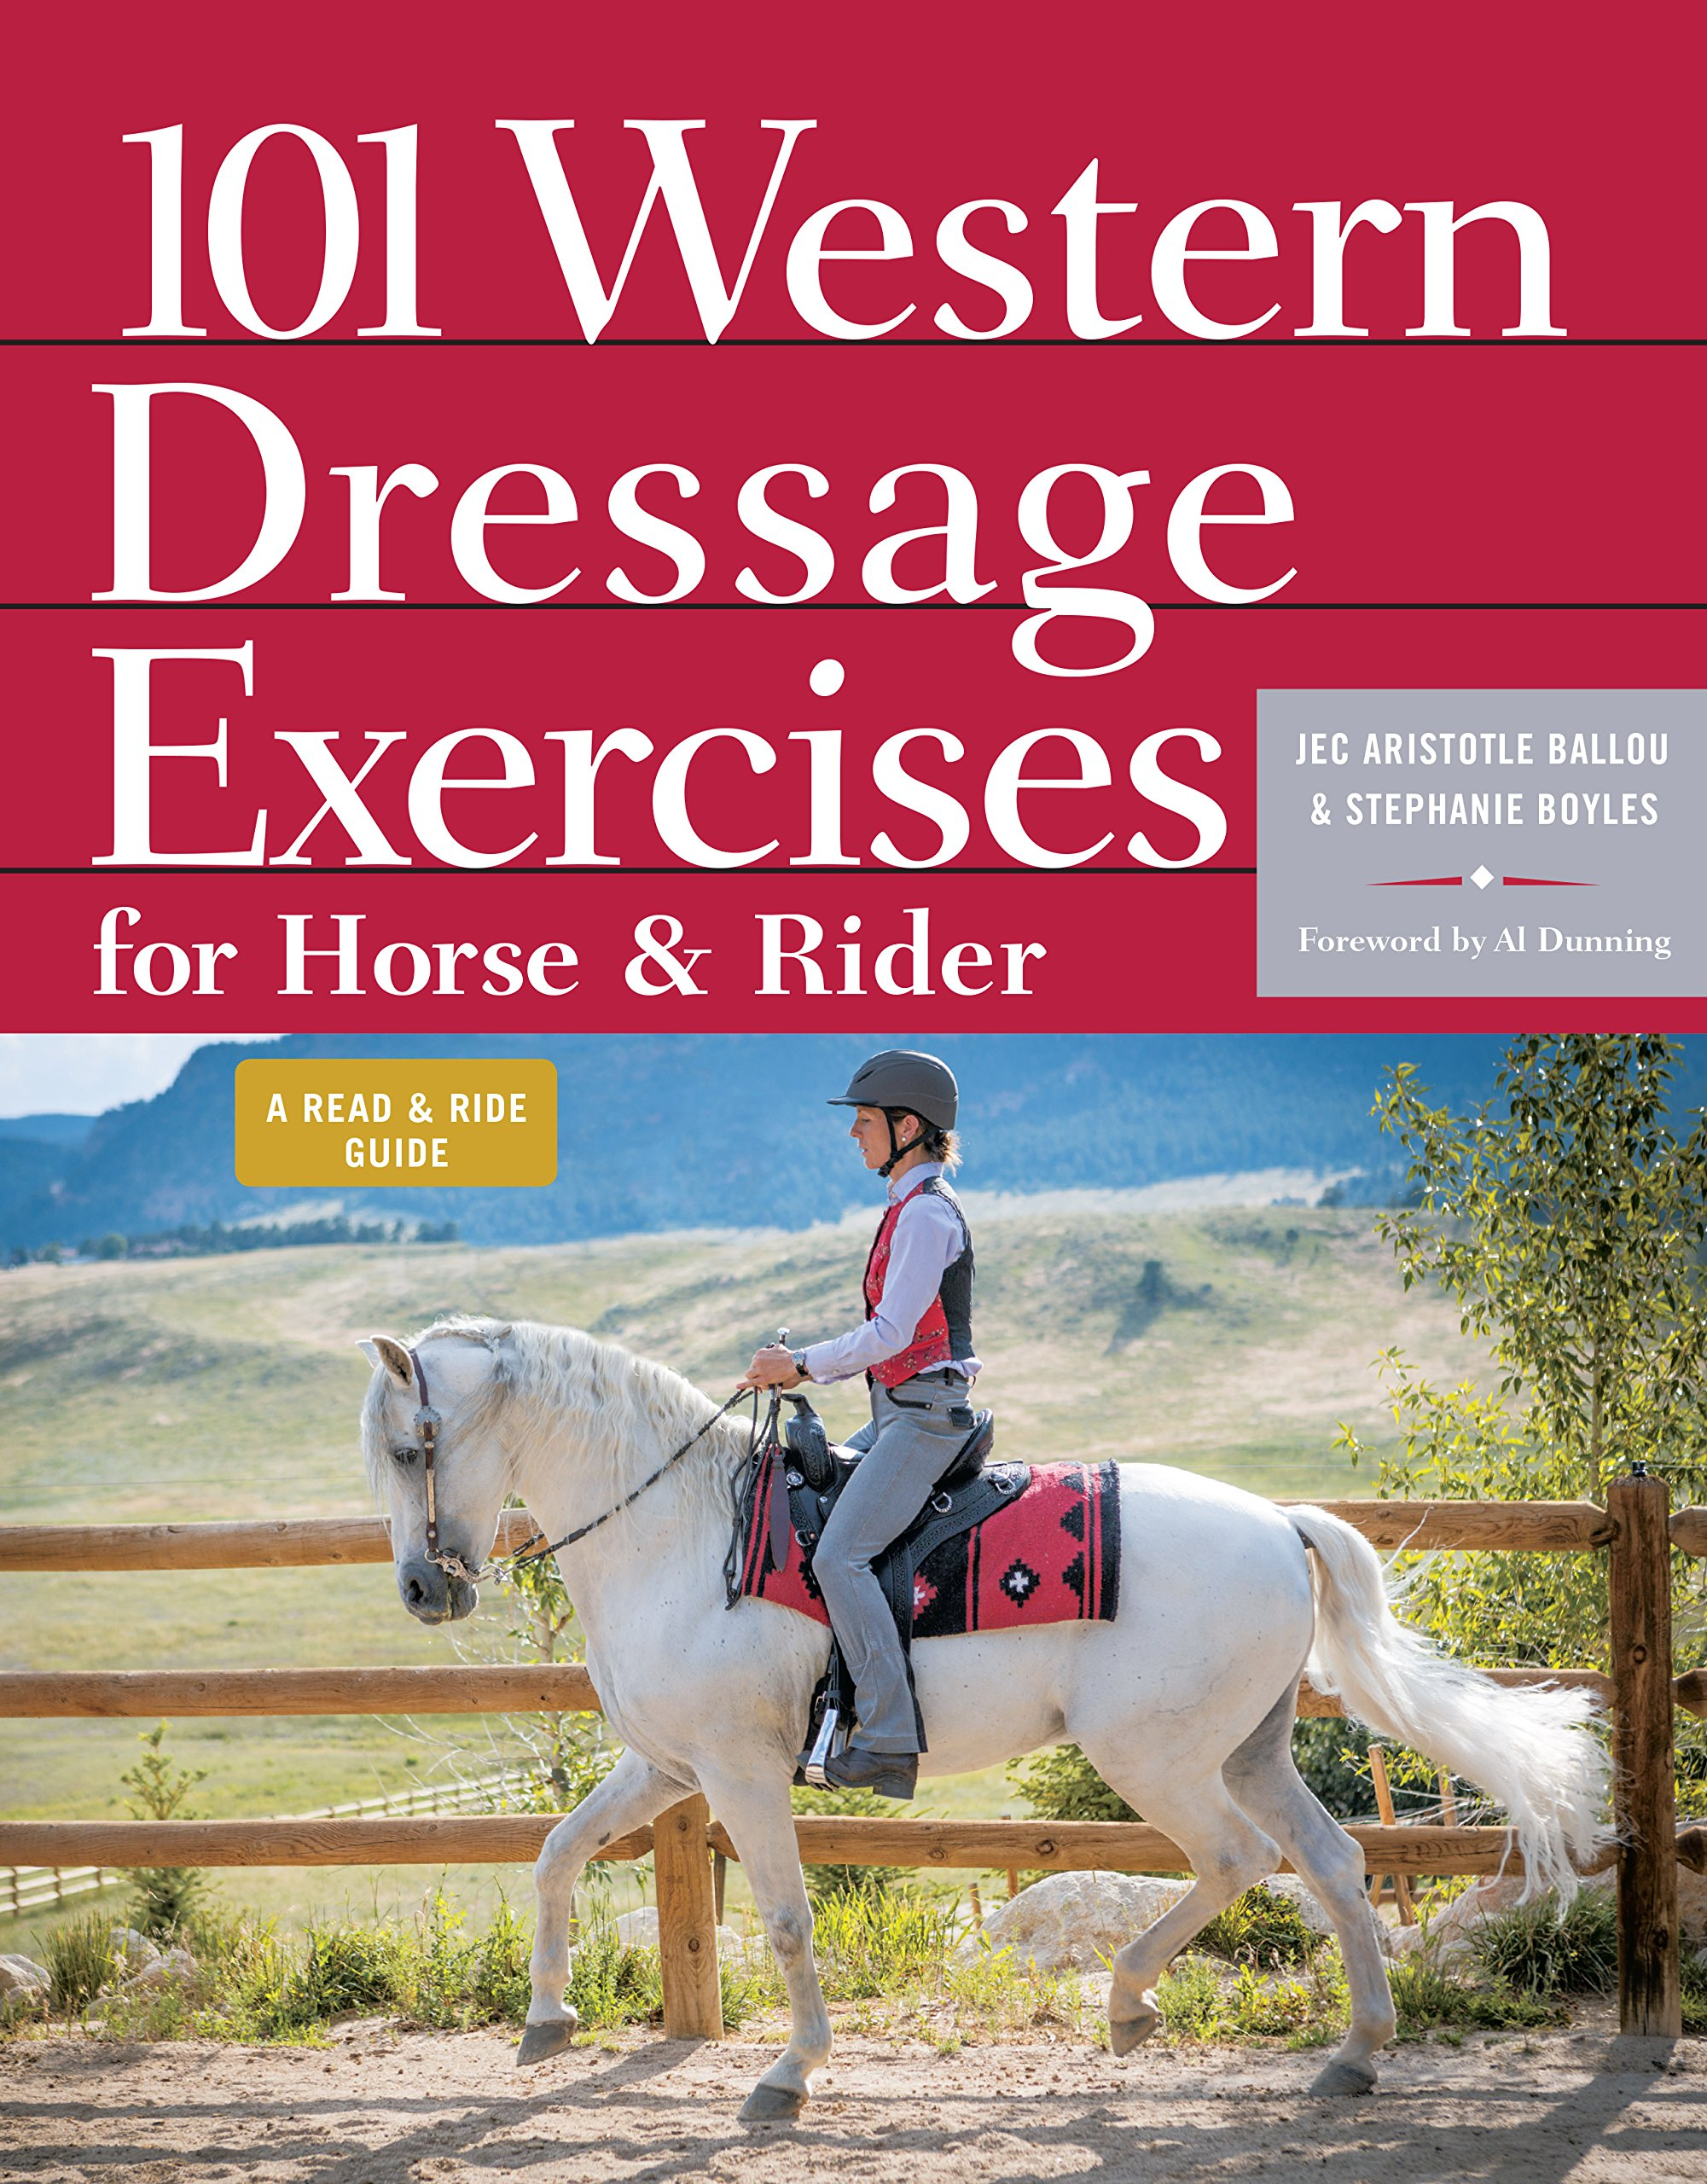 101 Western Dressage Excerises (Read & Ride)